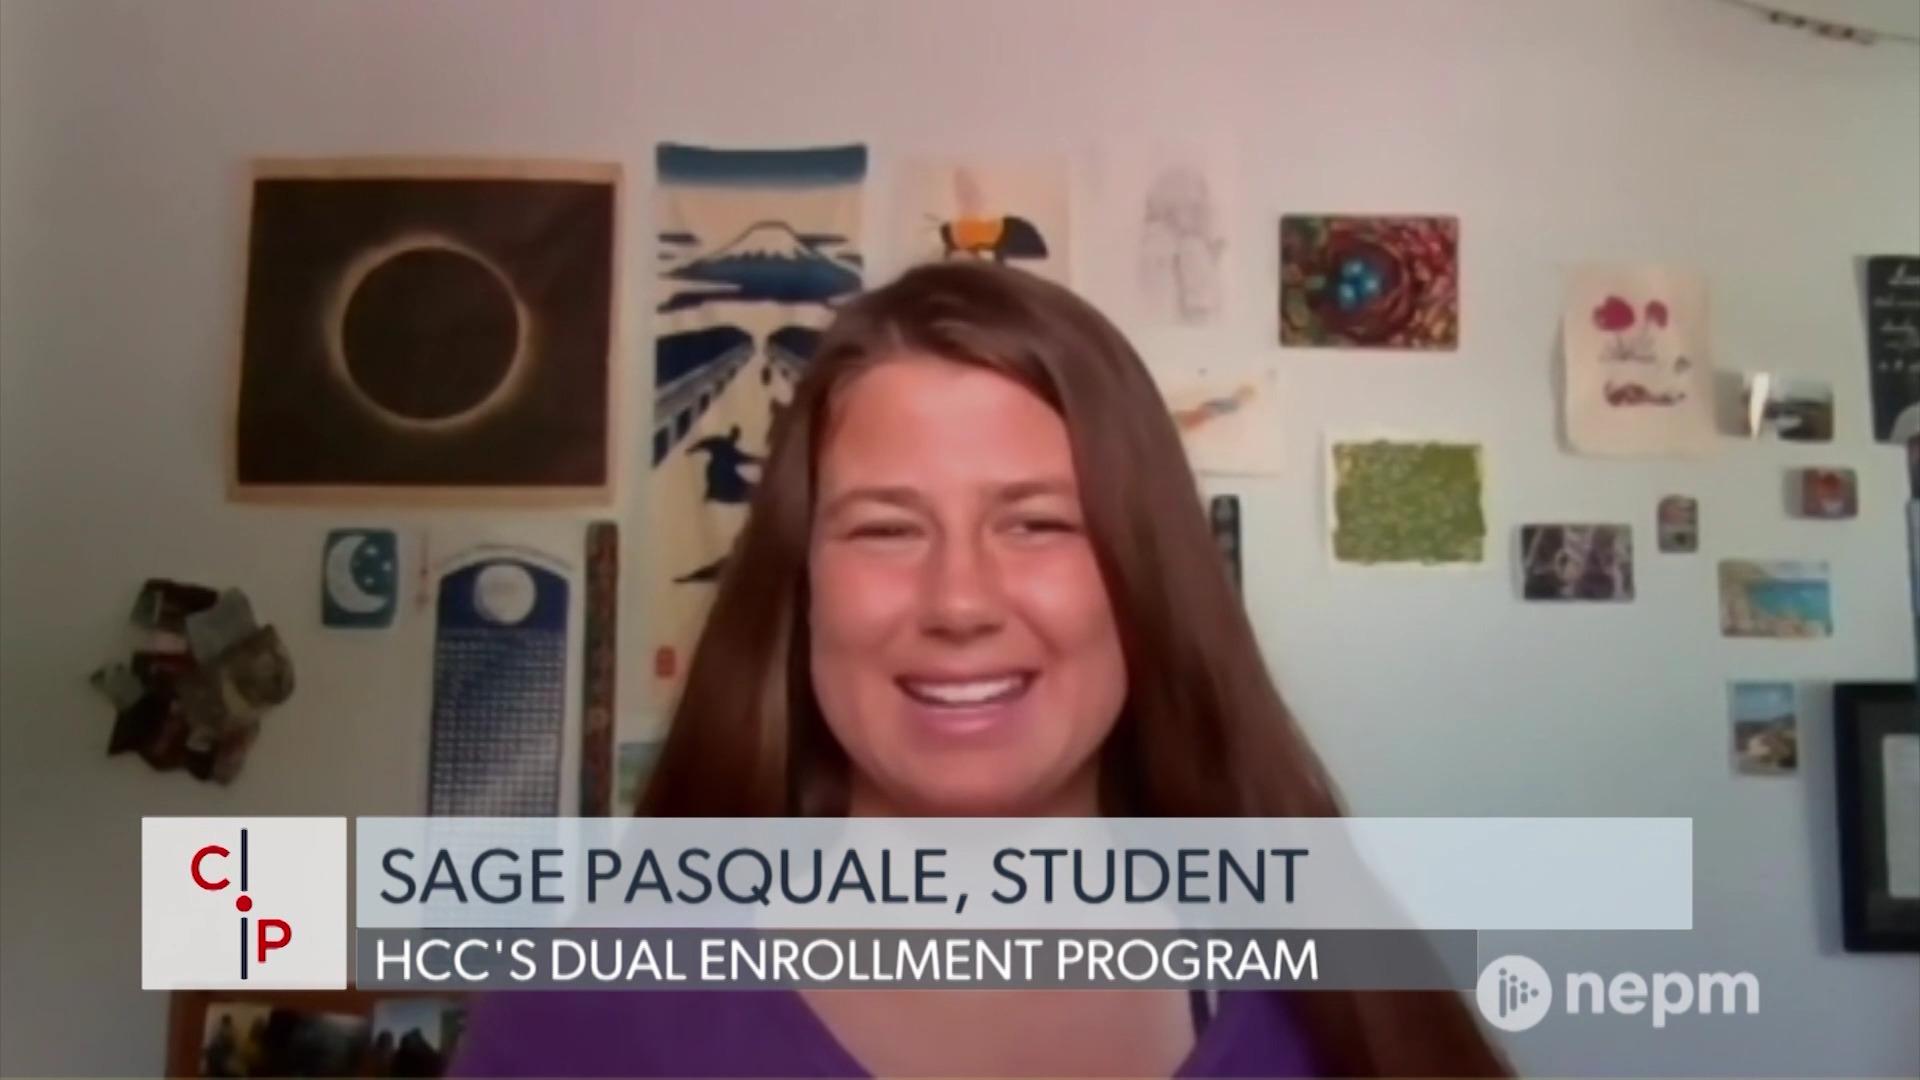 HCC Dual Enrollment Program